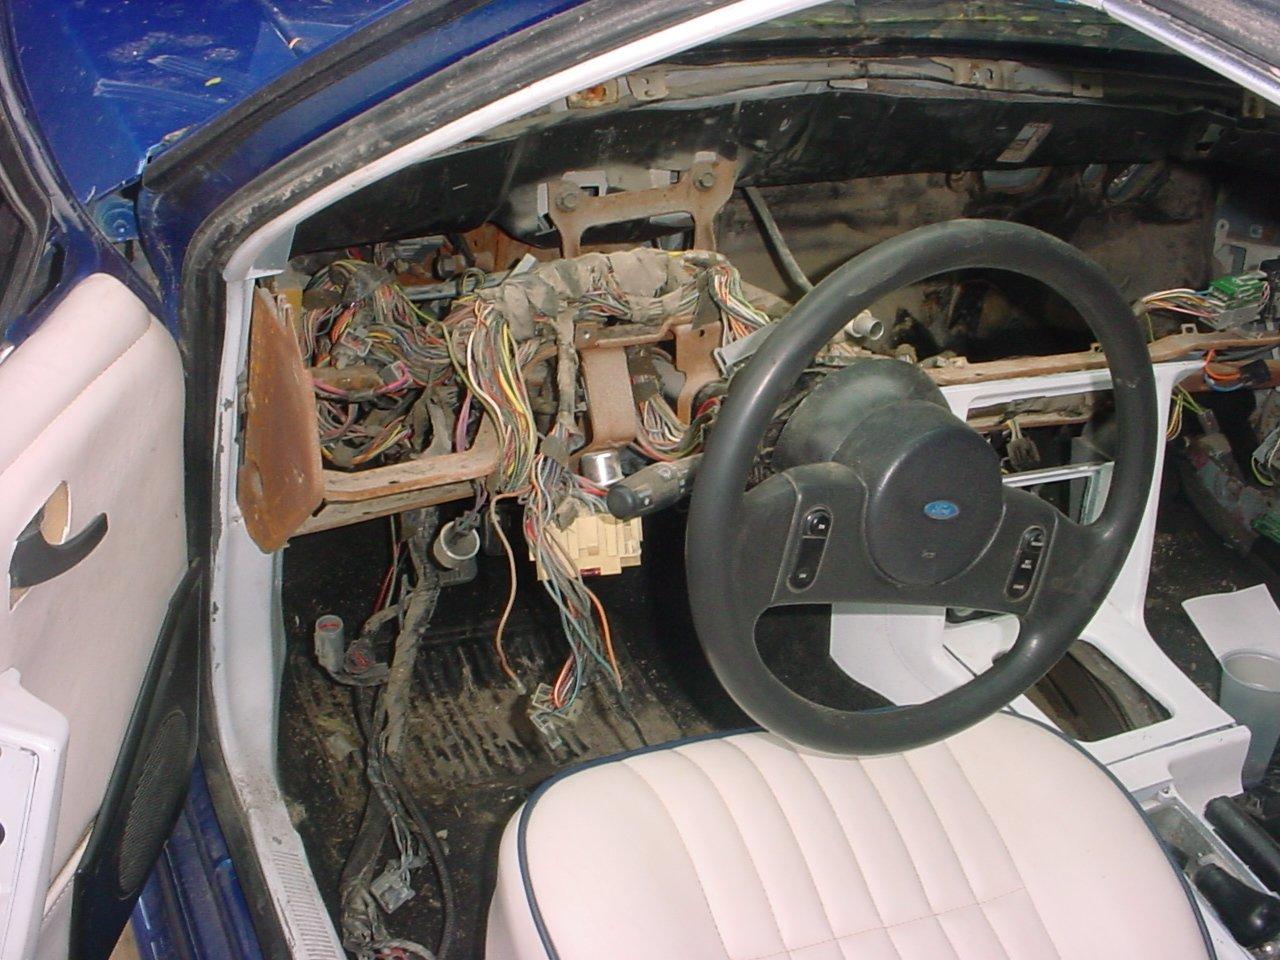 1990 Mustang Gt Dash Wiring Harness Wiring Diagram Teach Teach Lechicchedimammavale It